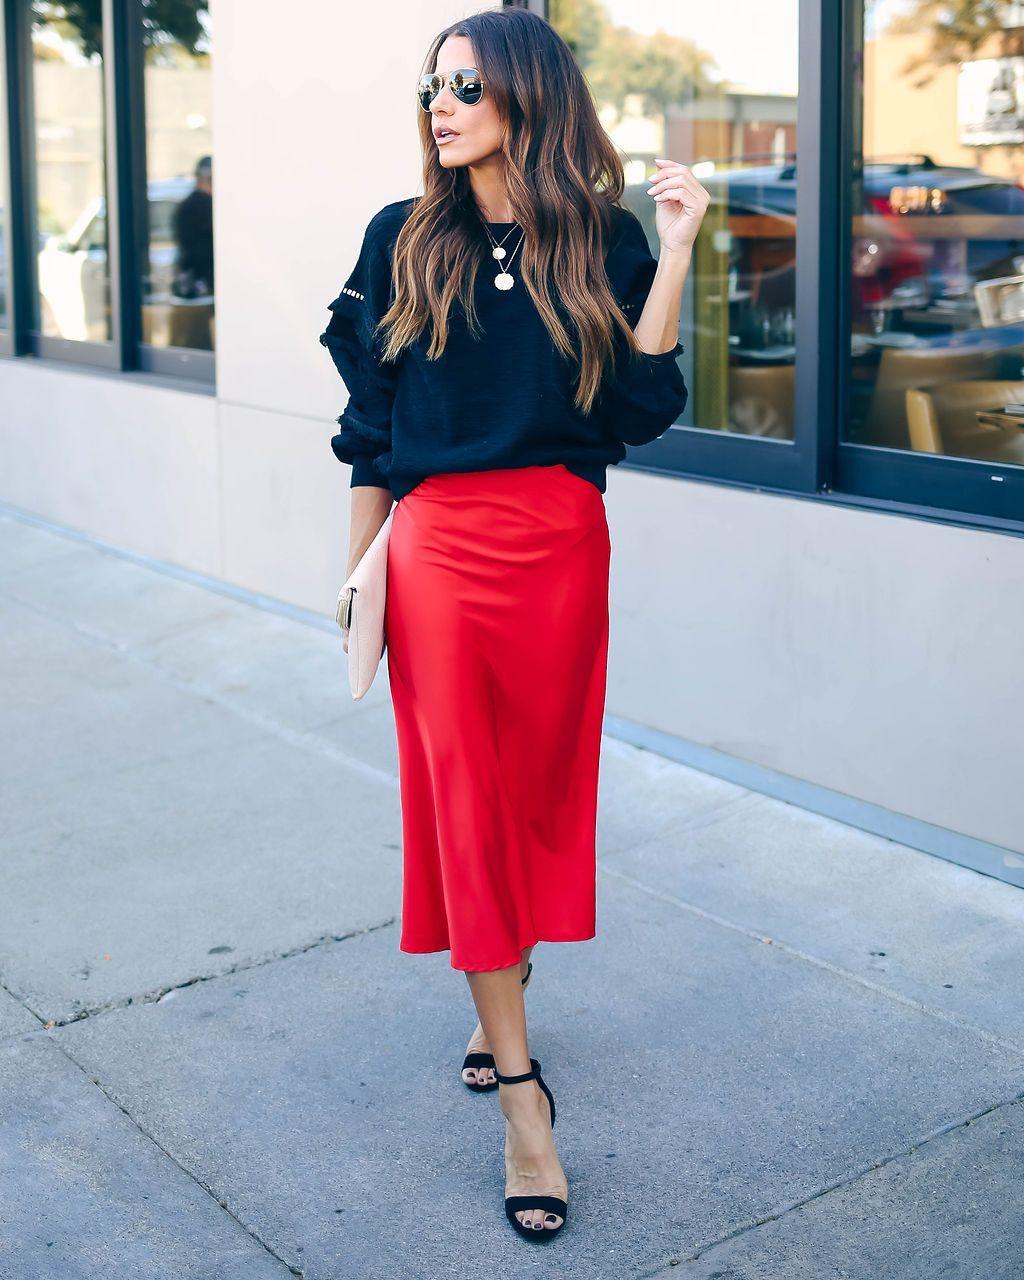 Red pencil skirt midi length  LARGE